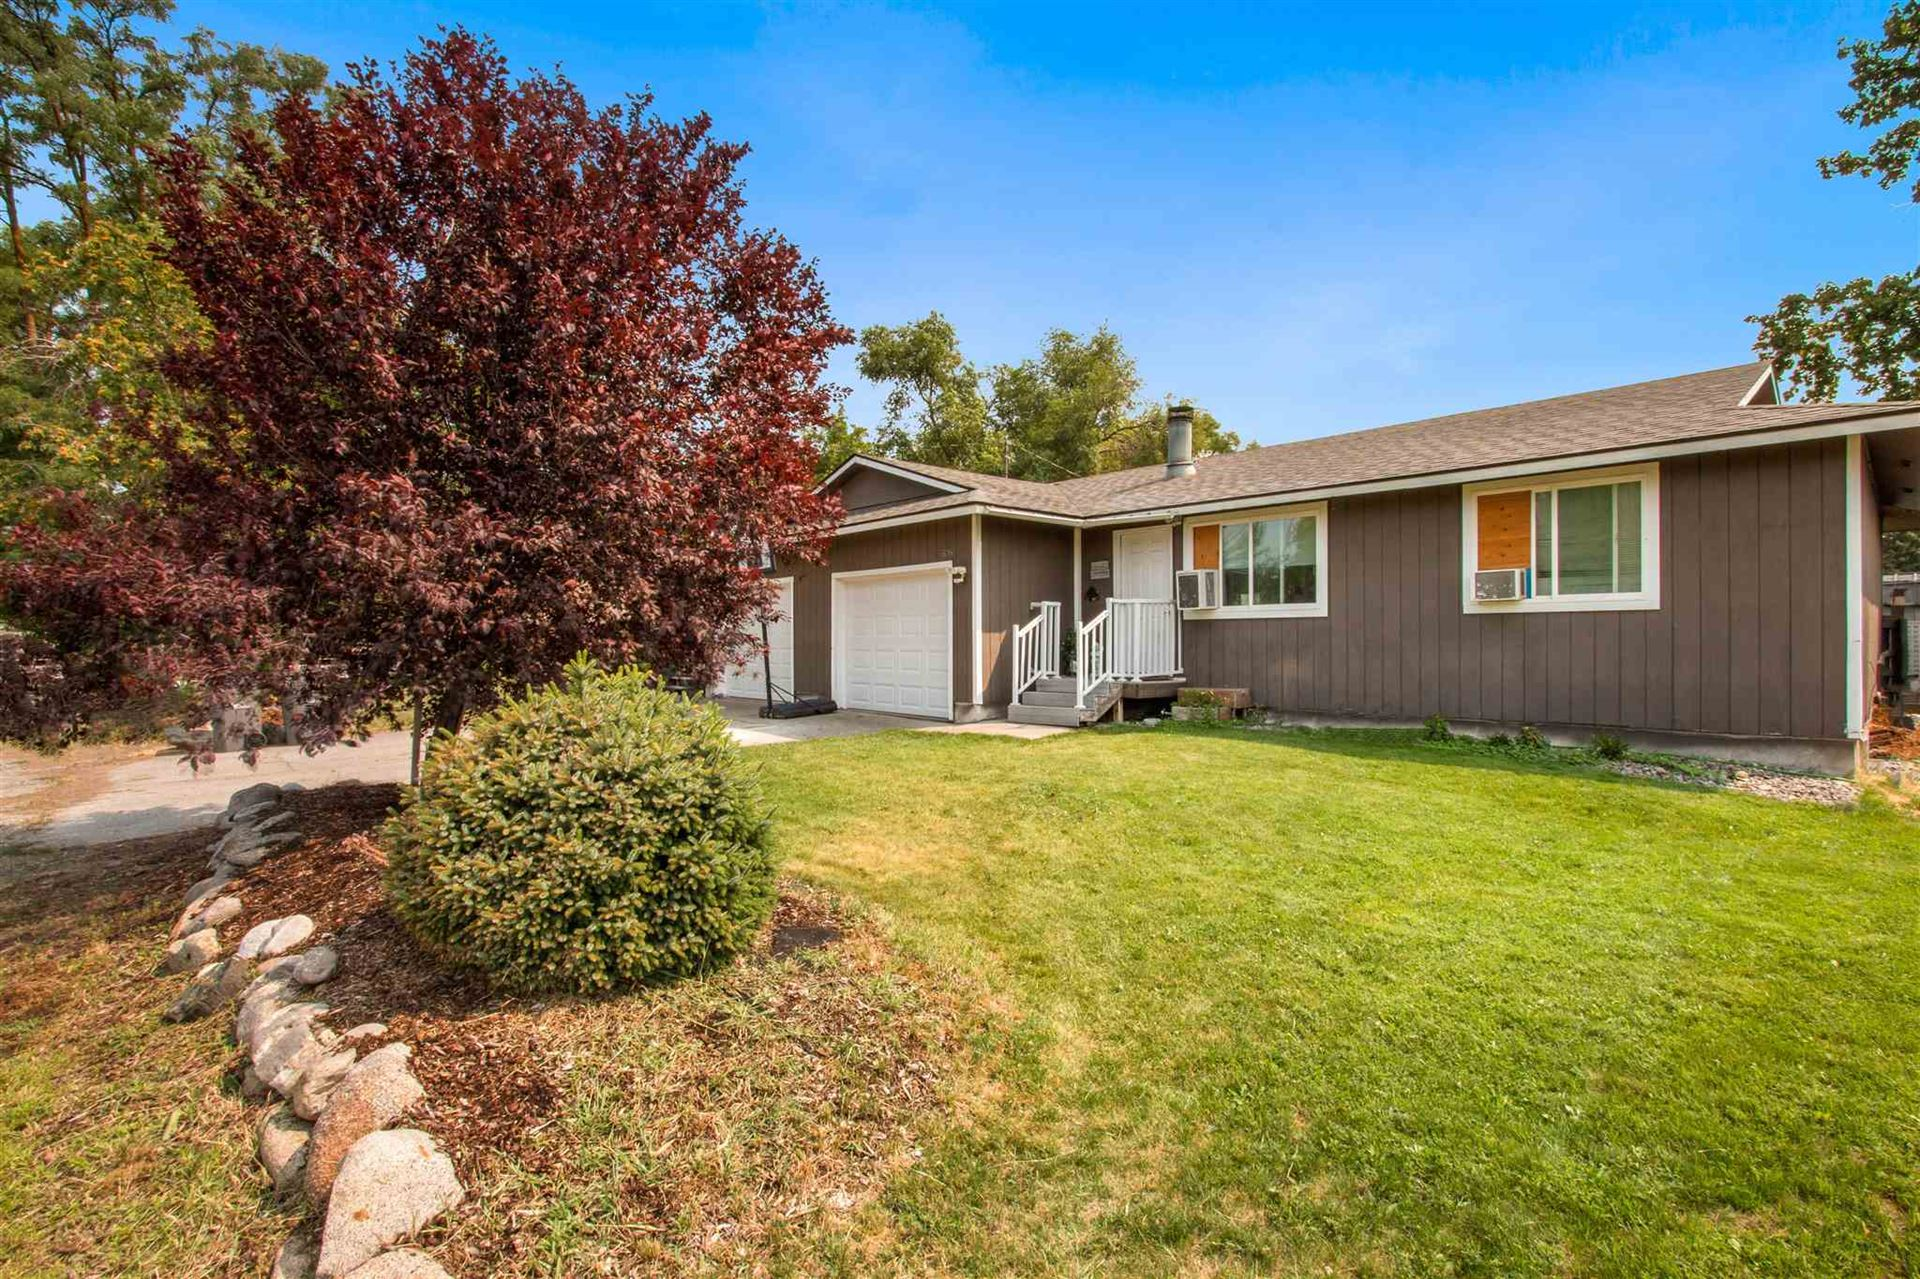 506 N Bessie Rd, Spokane Valley, WA 99212 - #: 202119350